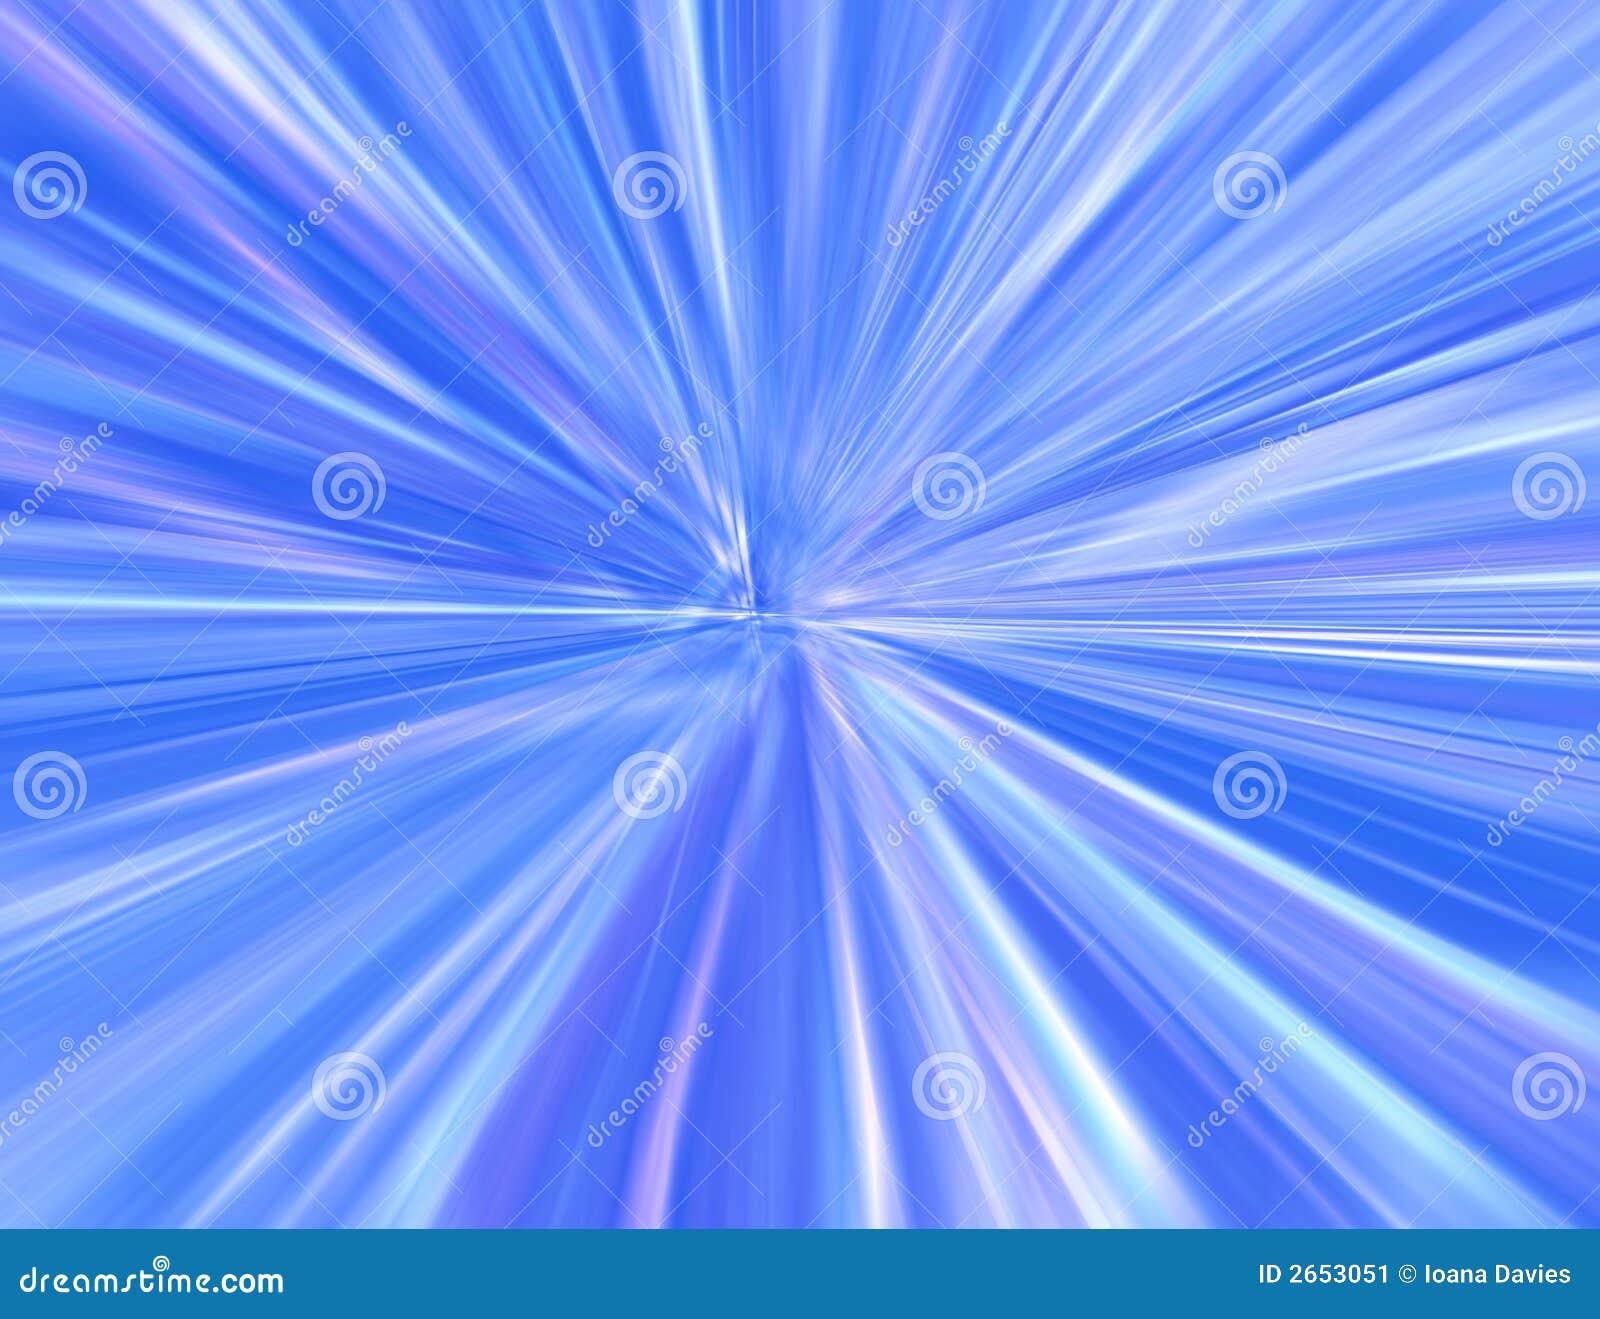 Starburst azul